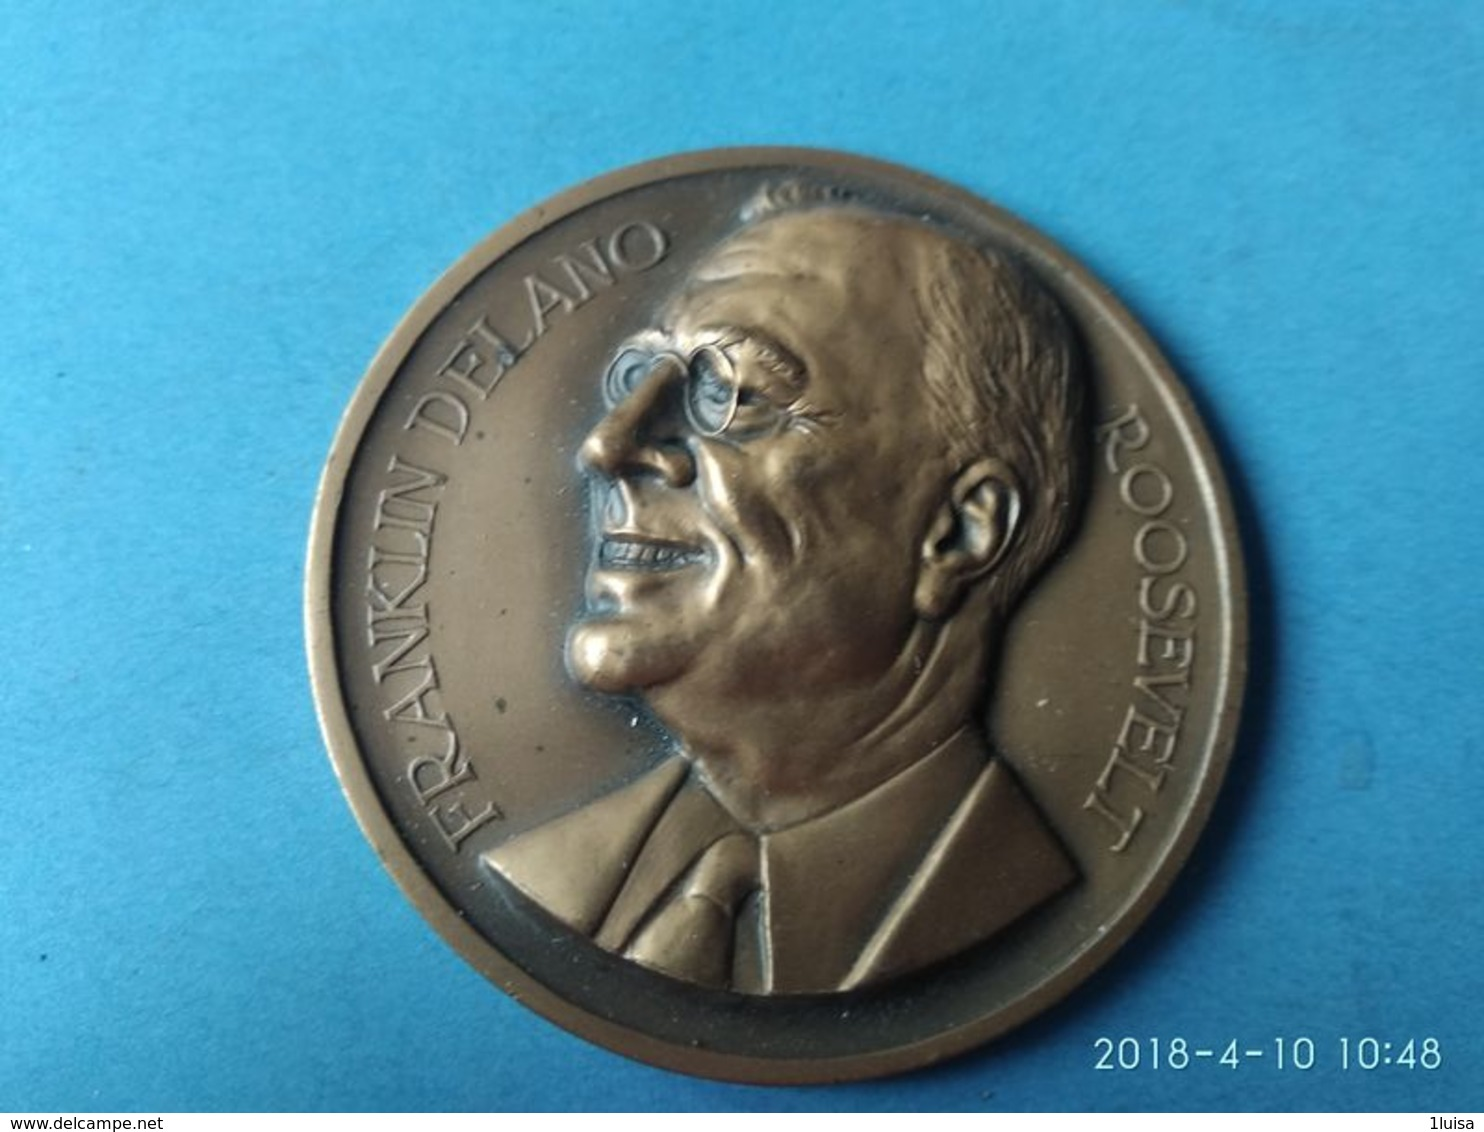 PRESIDENTI STATI UNITI Franklin Delano Roosevelt - Monarchia/ Nobiltà